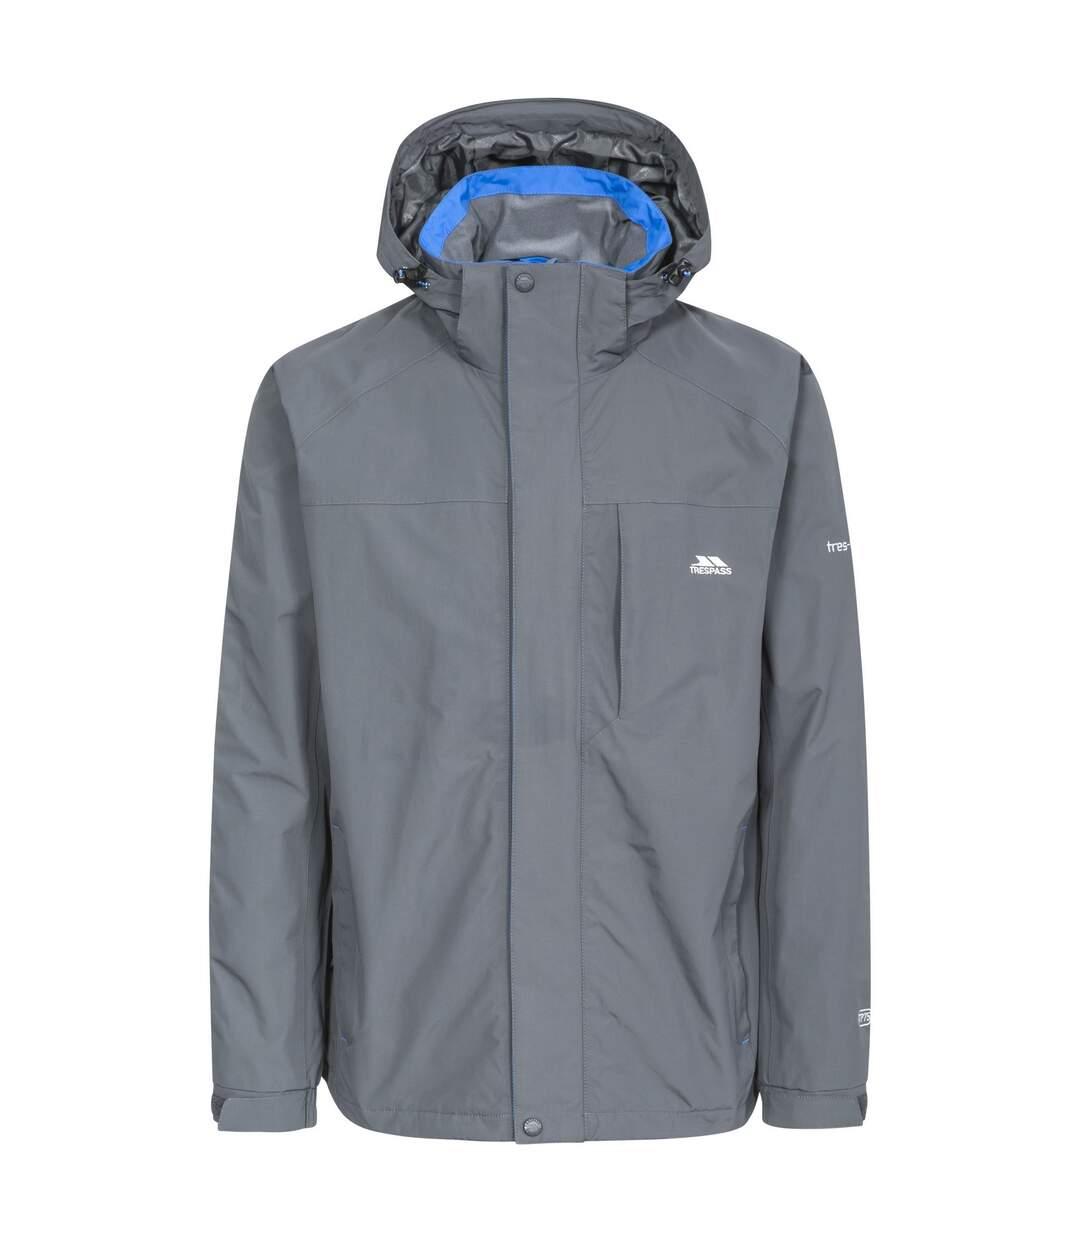 Trespass Mens Edwards II Waterproof Jacket (Carbon) - UTTP4118